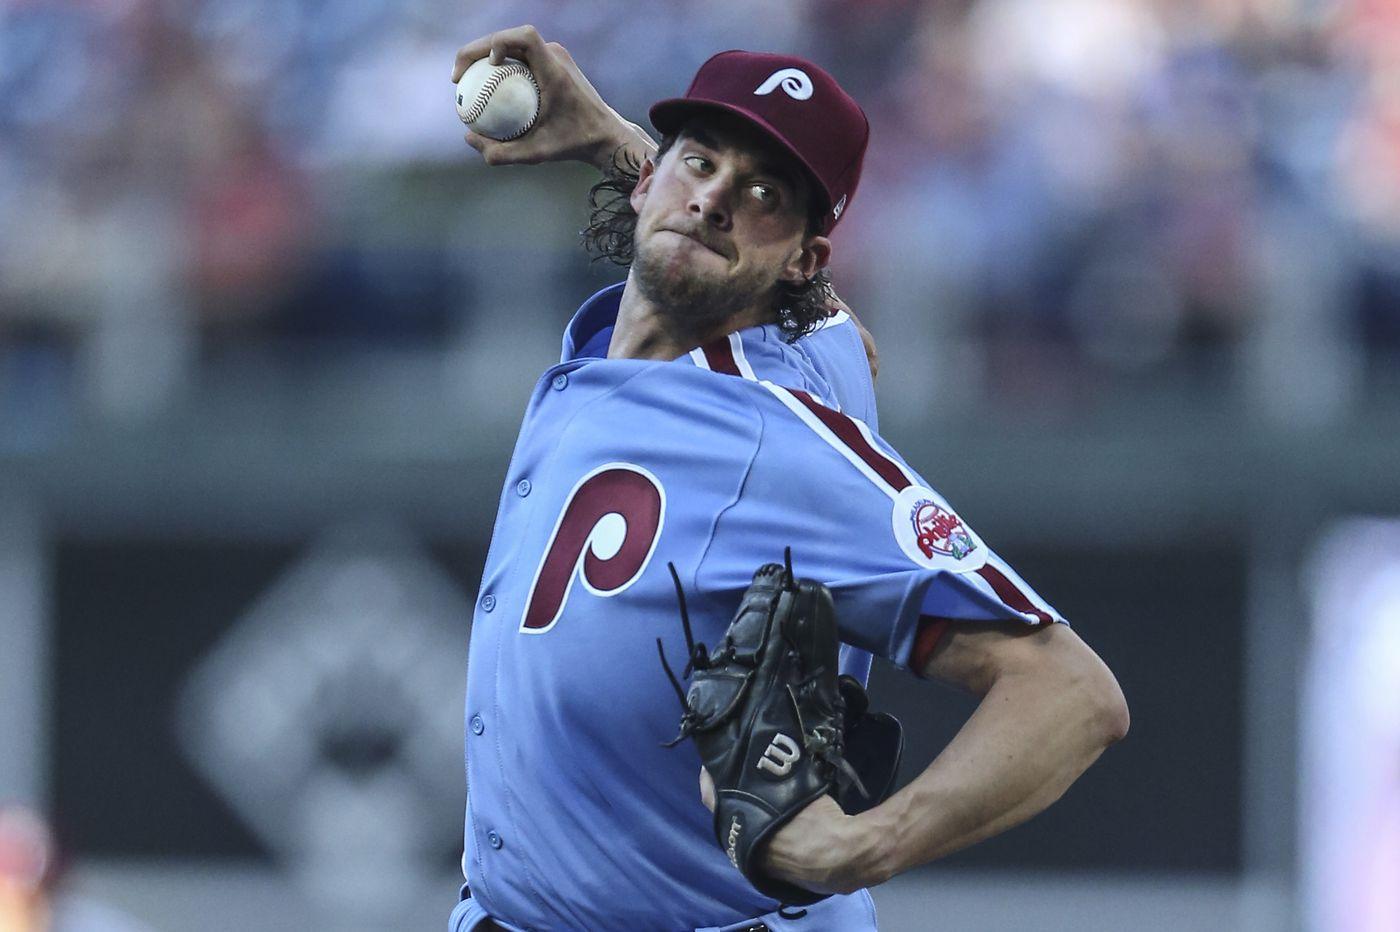 Phillies beat Nationals behind Aaron Nola's gem, Seranthony Dominguez's close